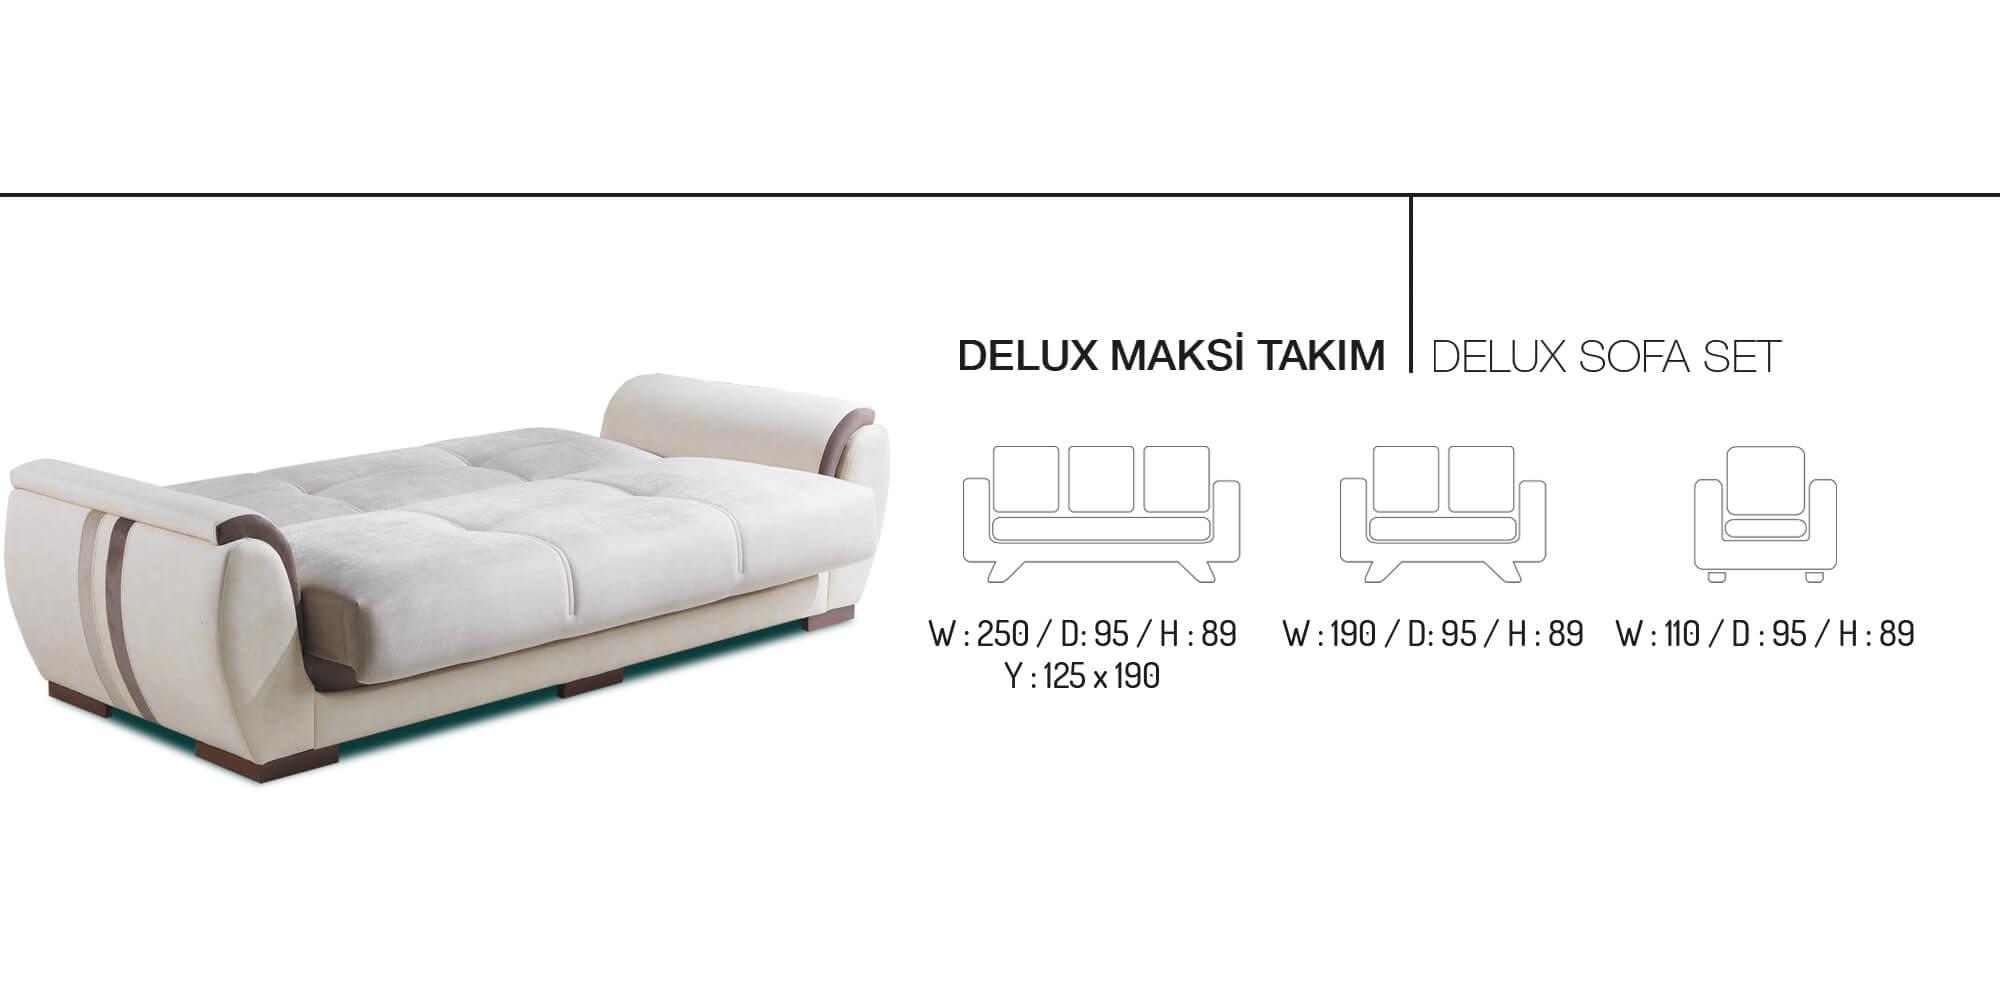 deserto-deluxe-sofa-set-4